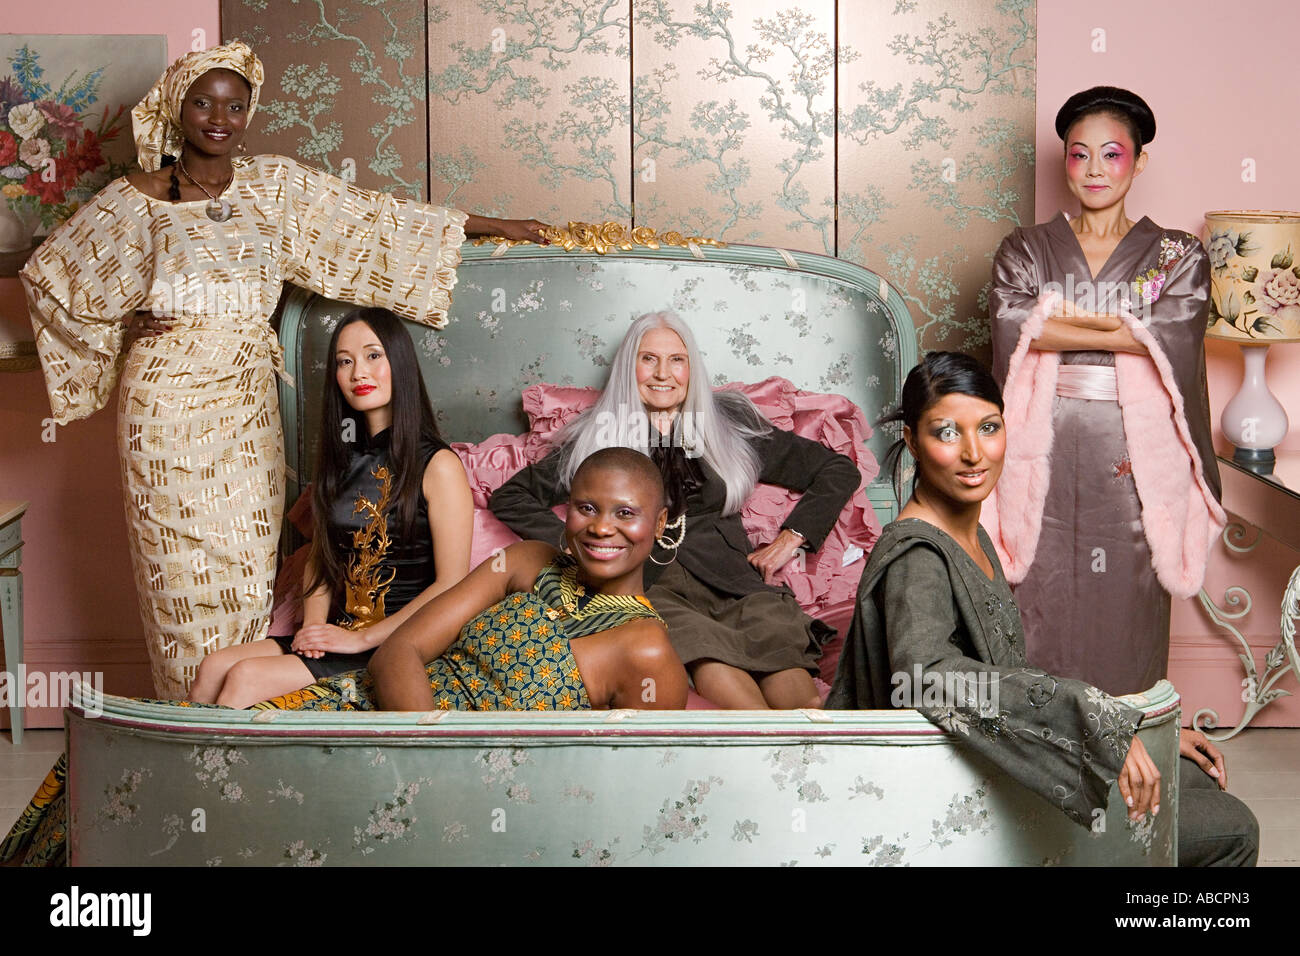 Six women wearing traditional clothing - Stock Image